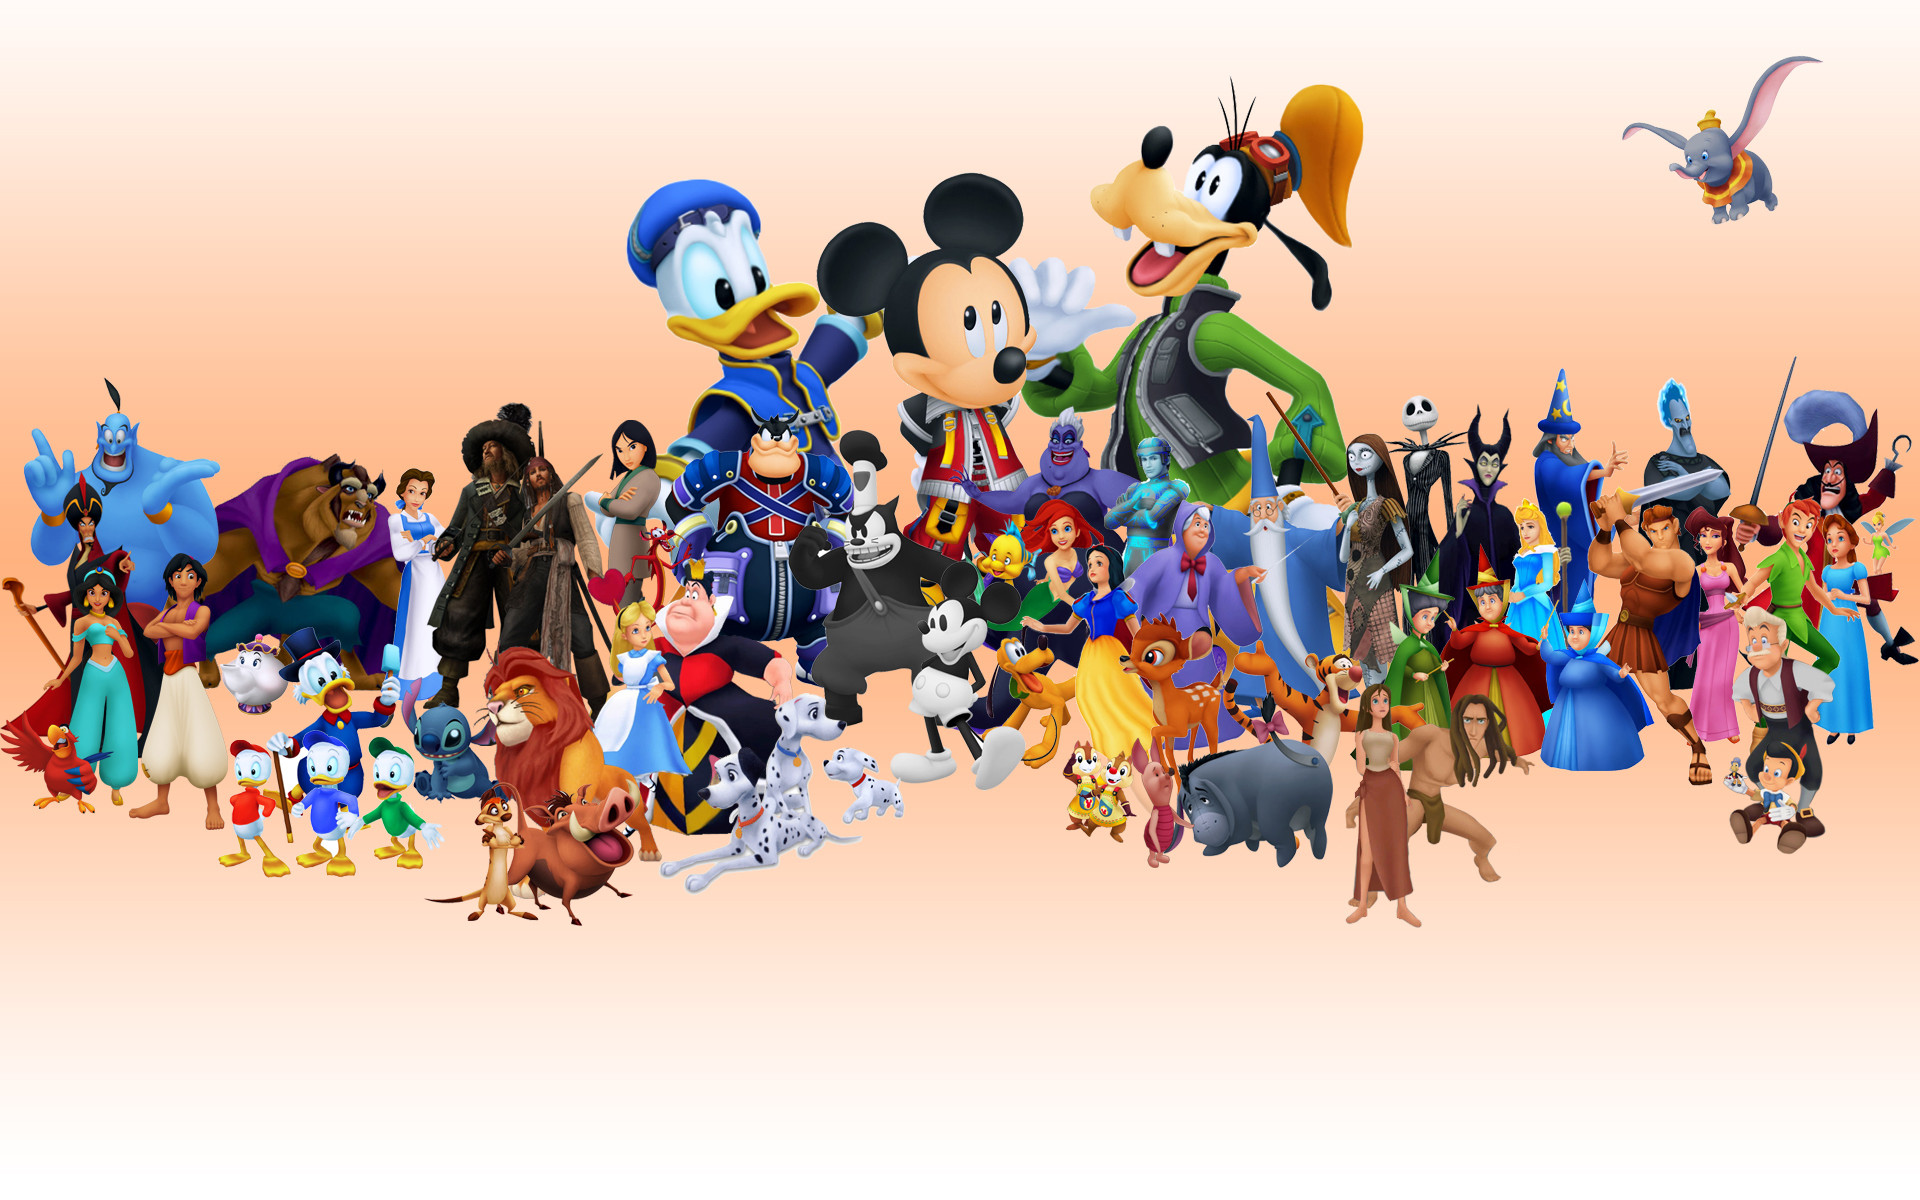 Download Free Disney Desktop Backgrounds Wallpaper pictures in high .